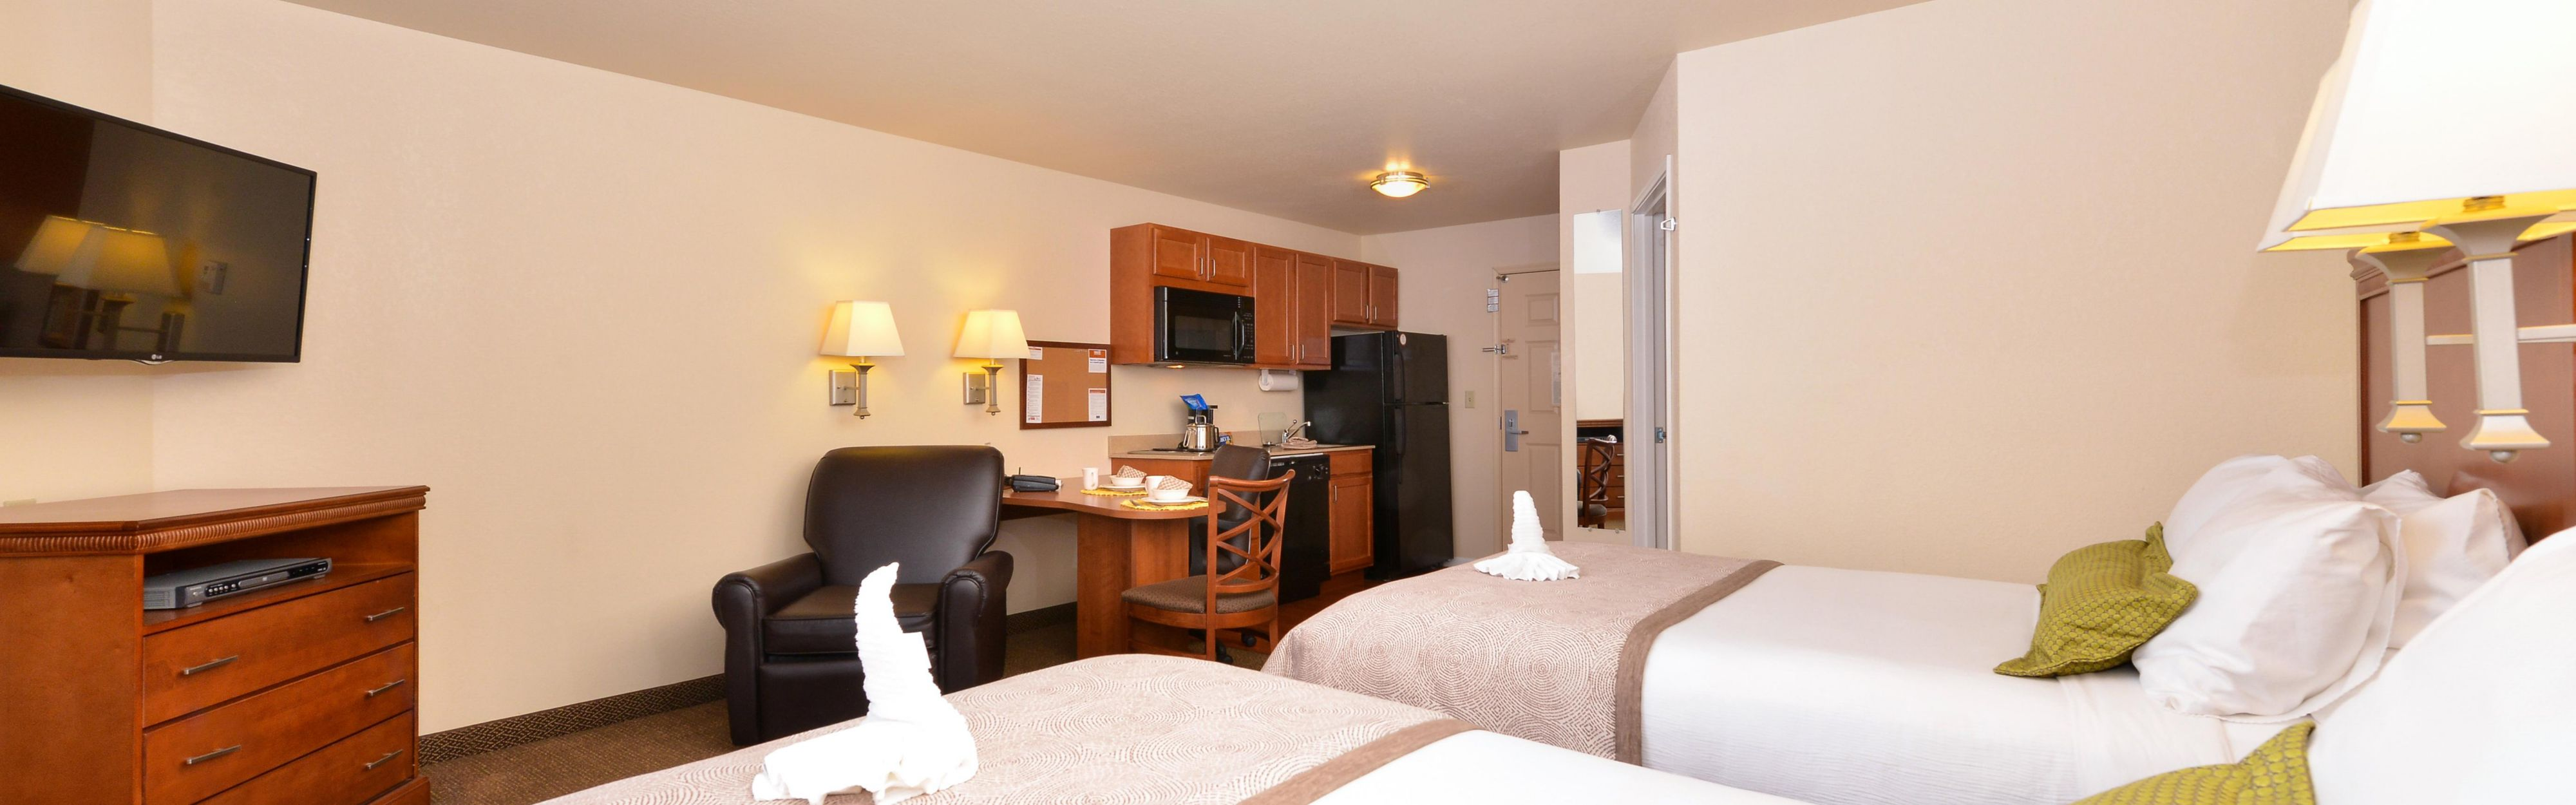 Candlewood Suites Bloomington-Normal image 1